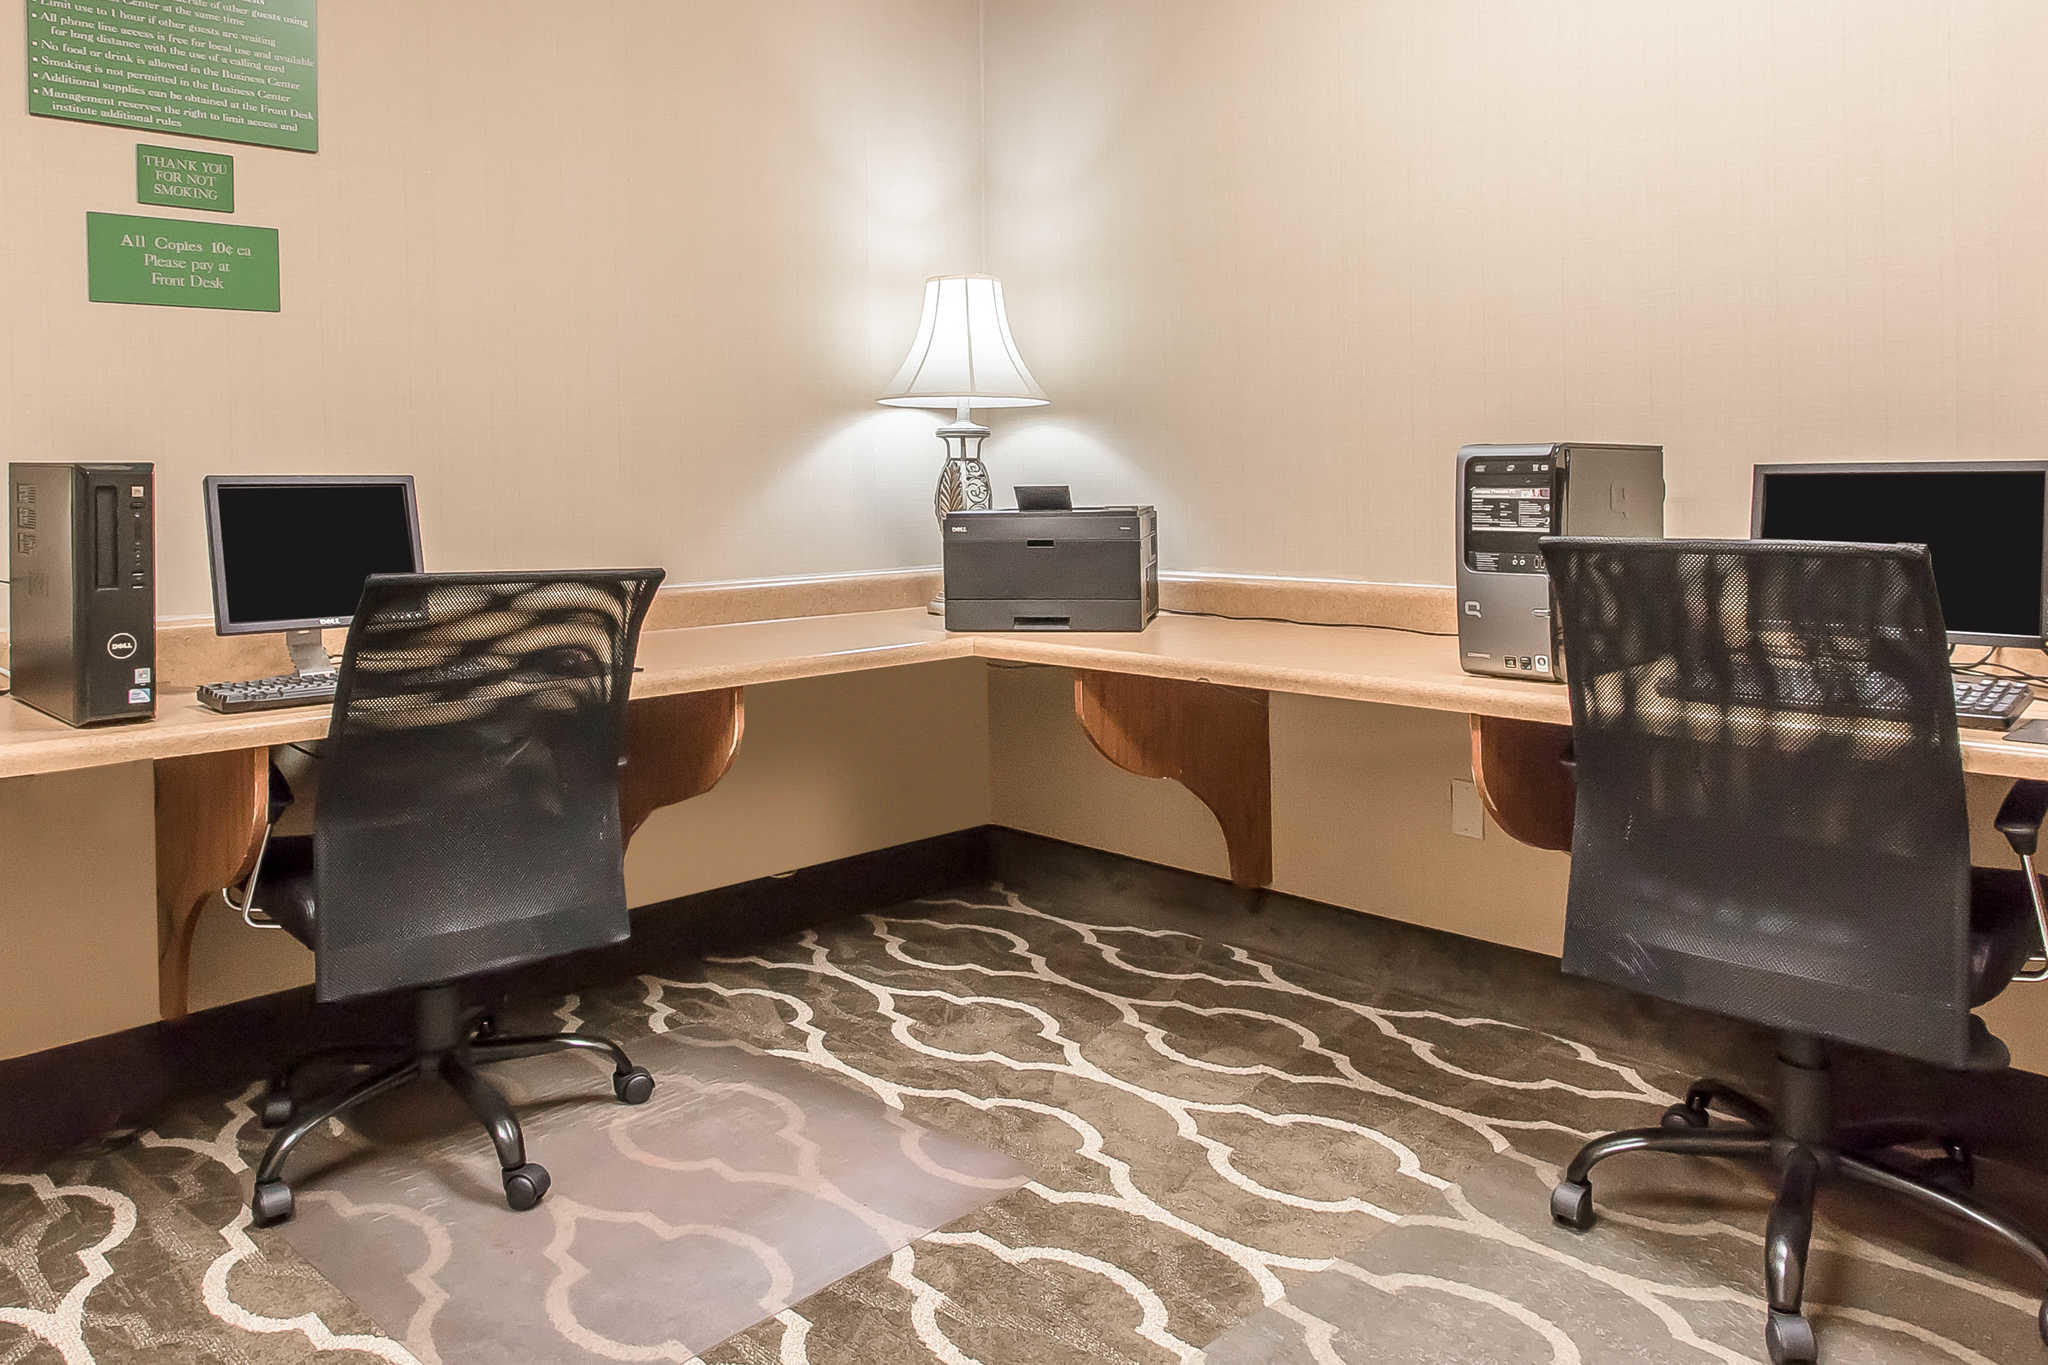 Comfort Suites image 43